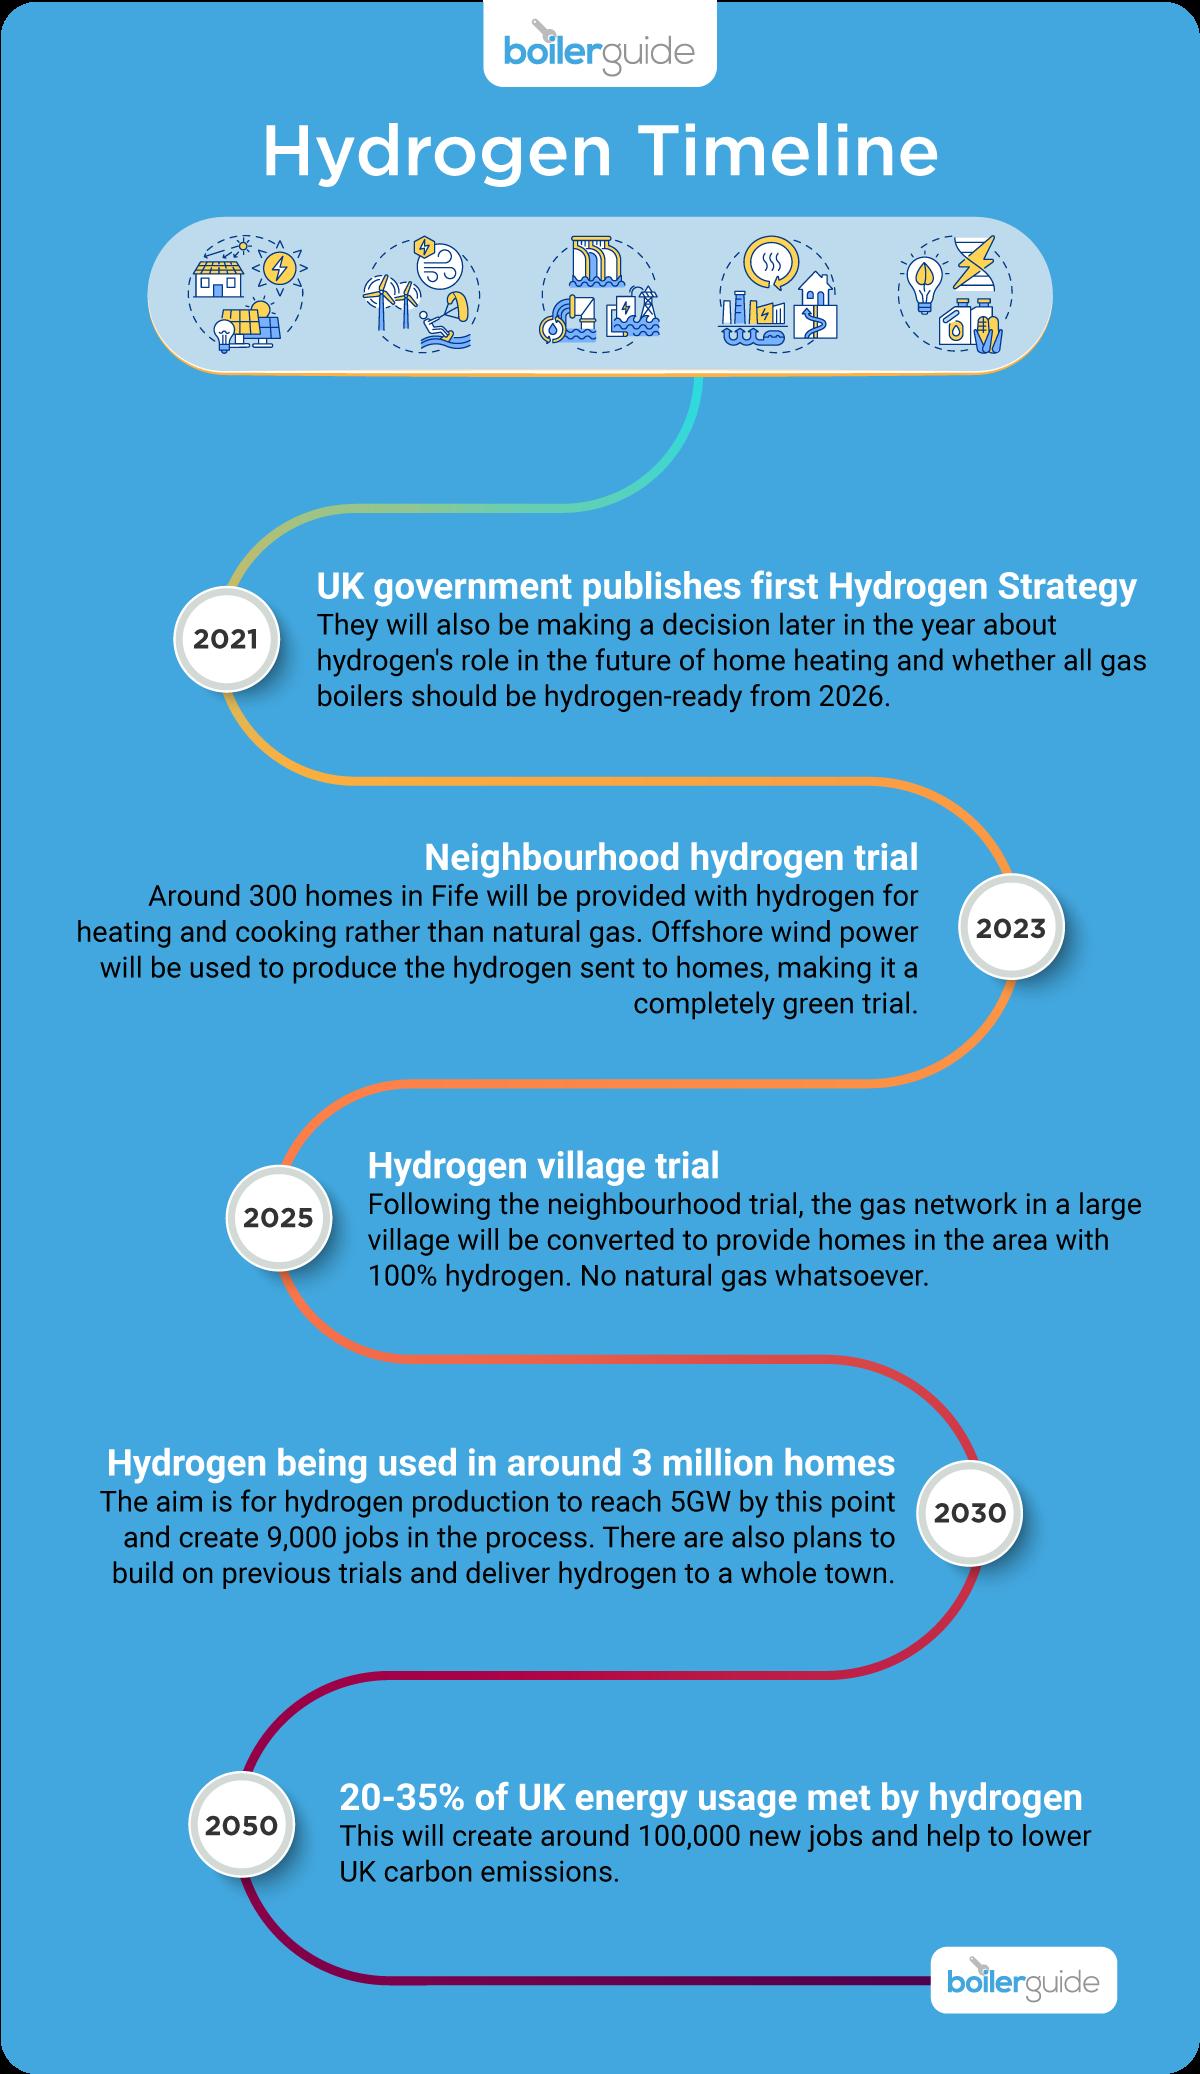 Hydrogen timeline: 2021-2050